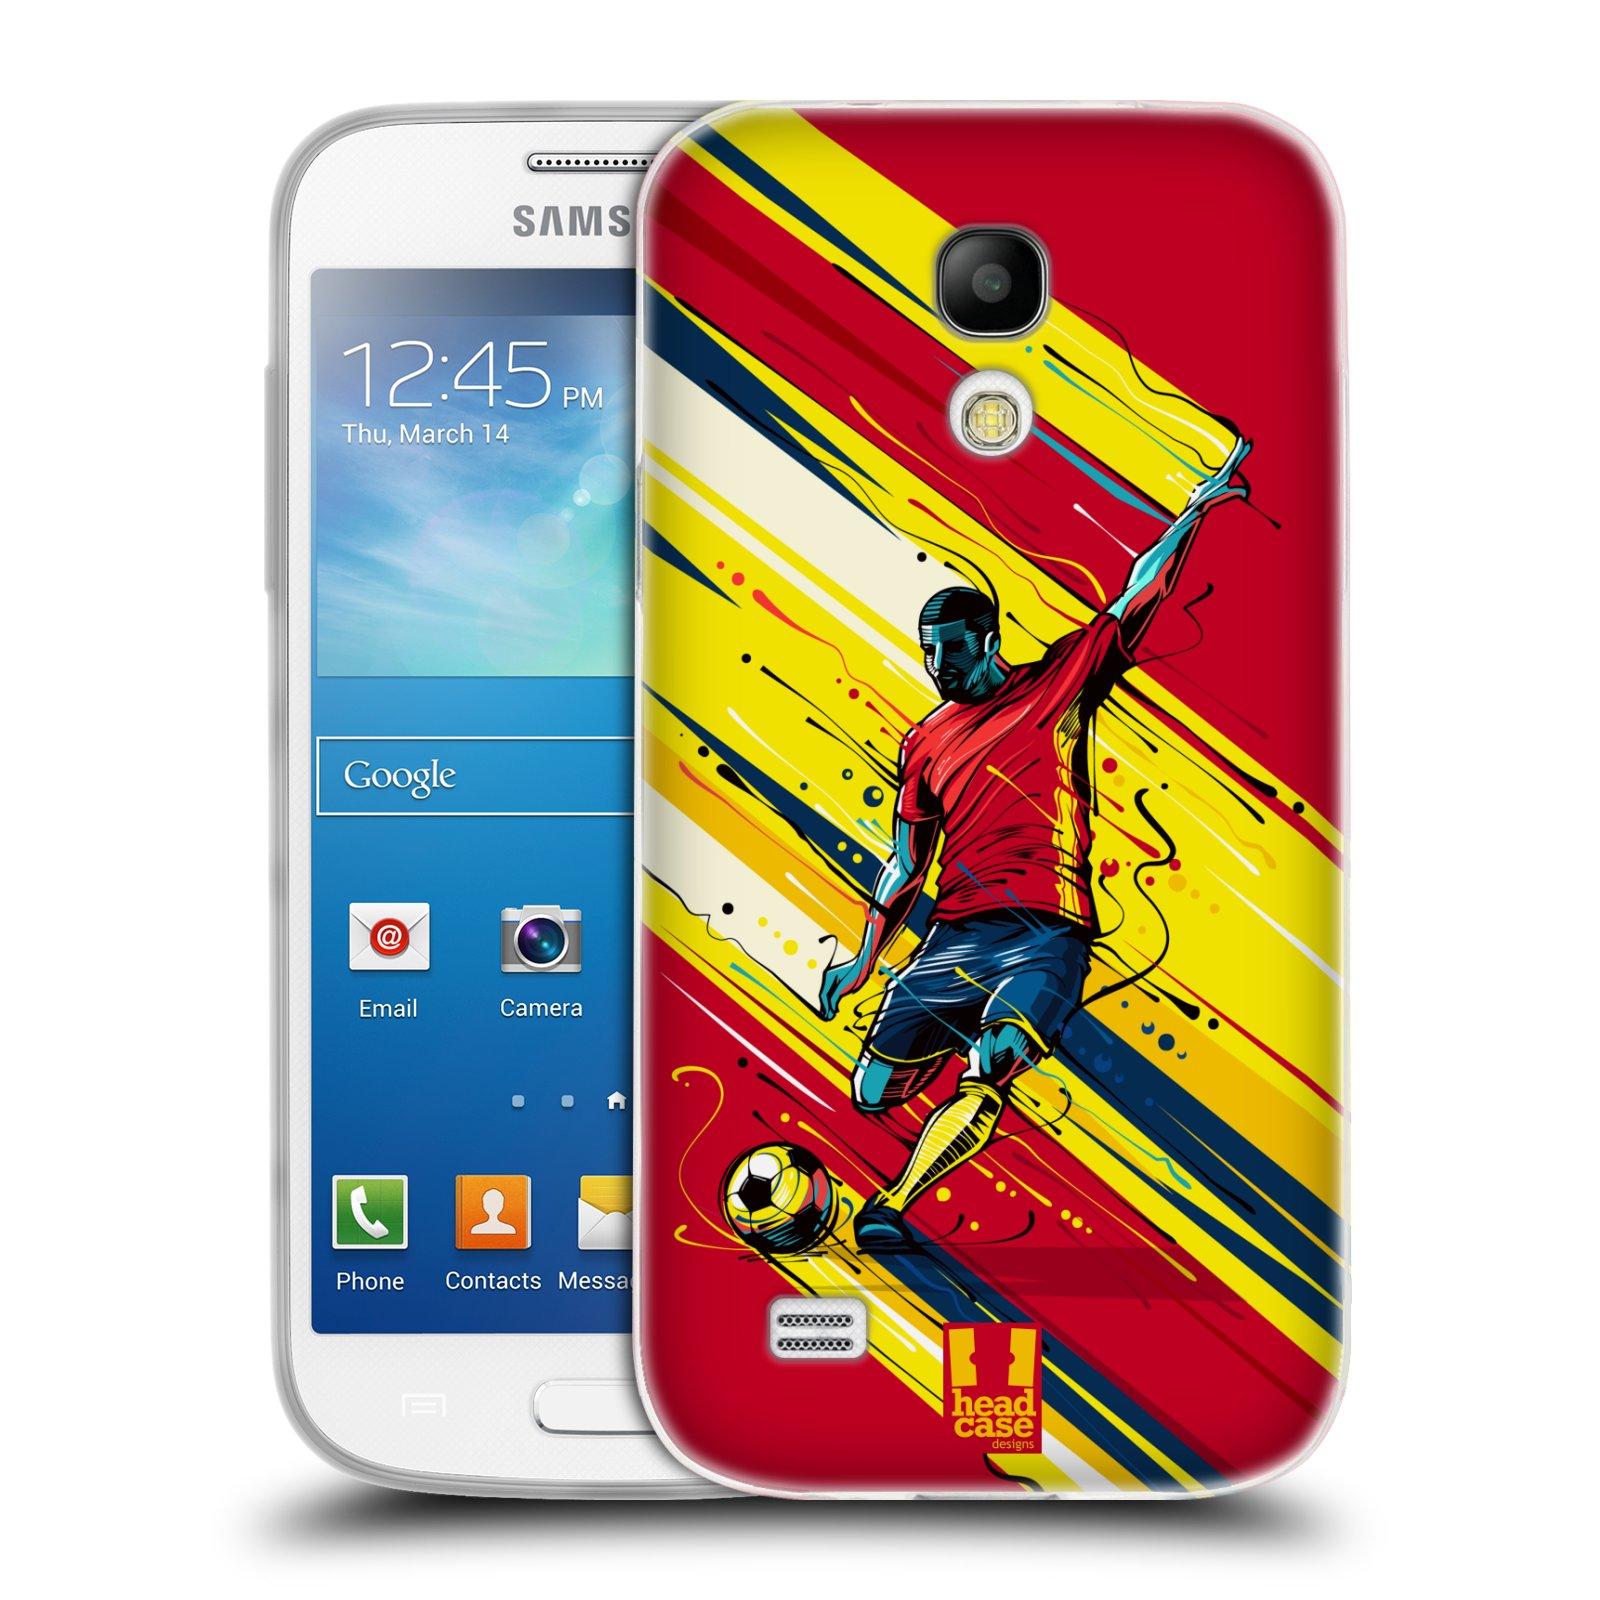 HEAD CASE silikonový obal na mobil Samsung Galaxy S4 MINI Sport fotbal střela do brány